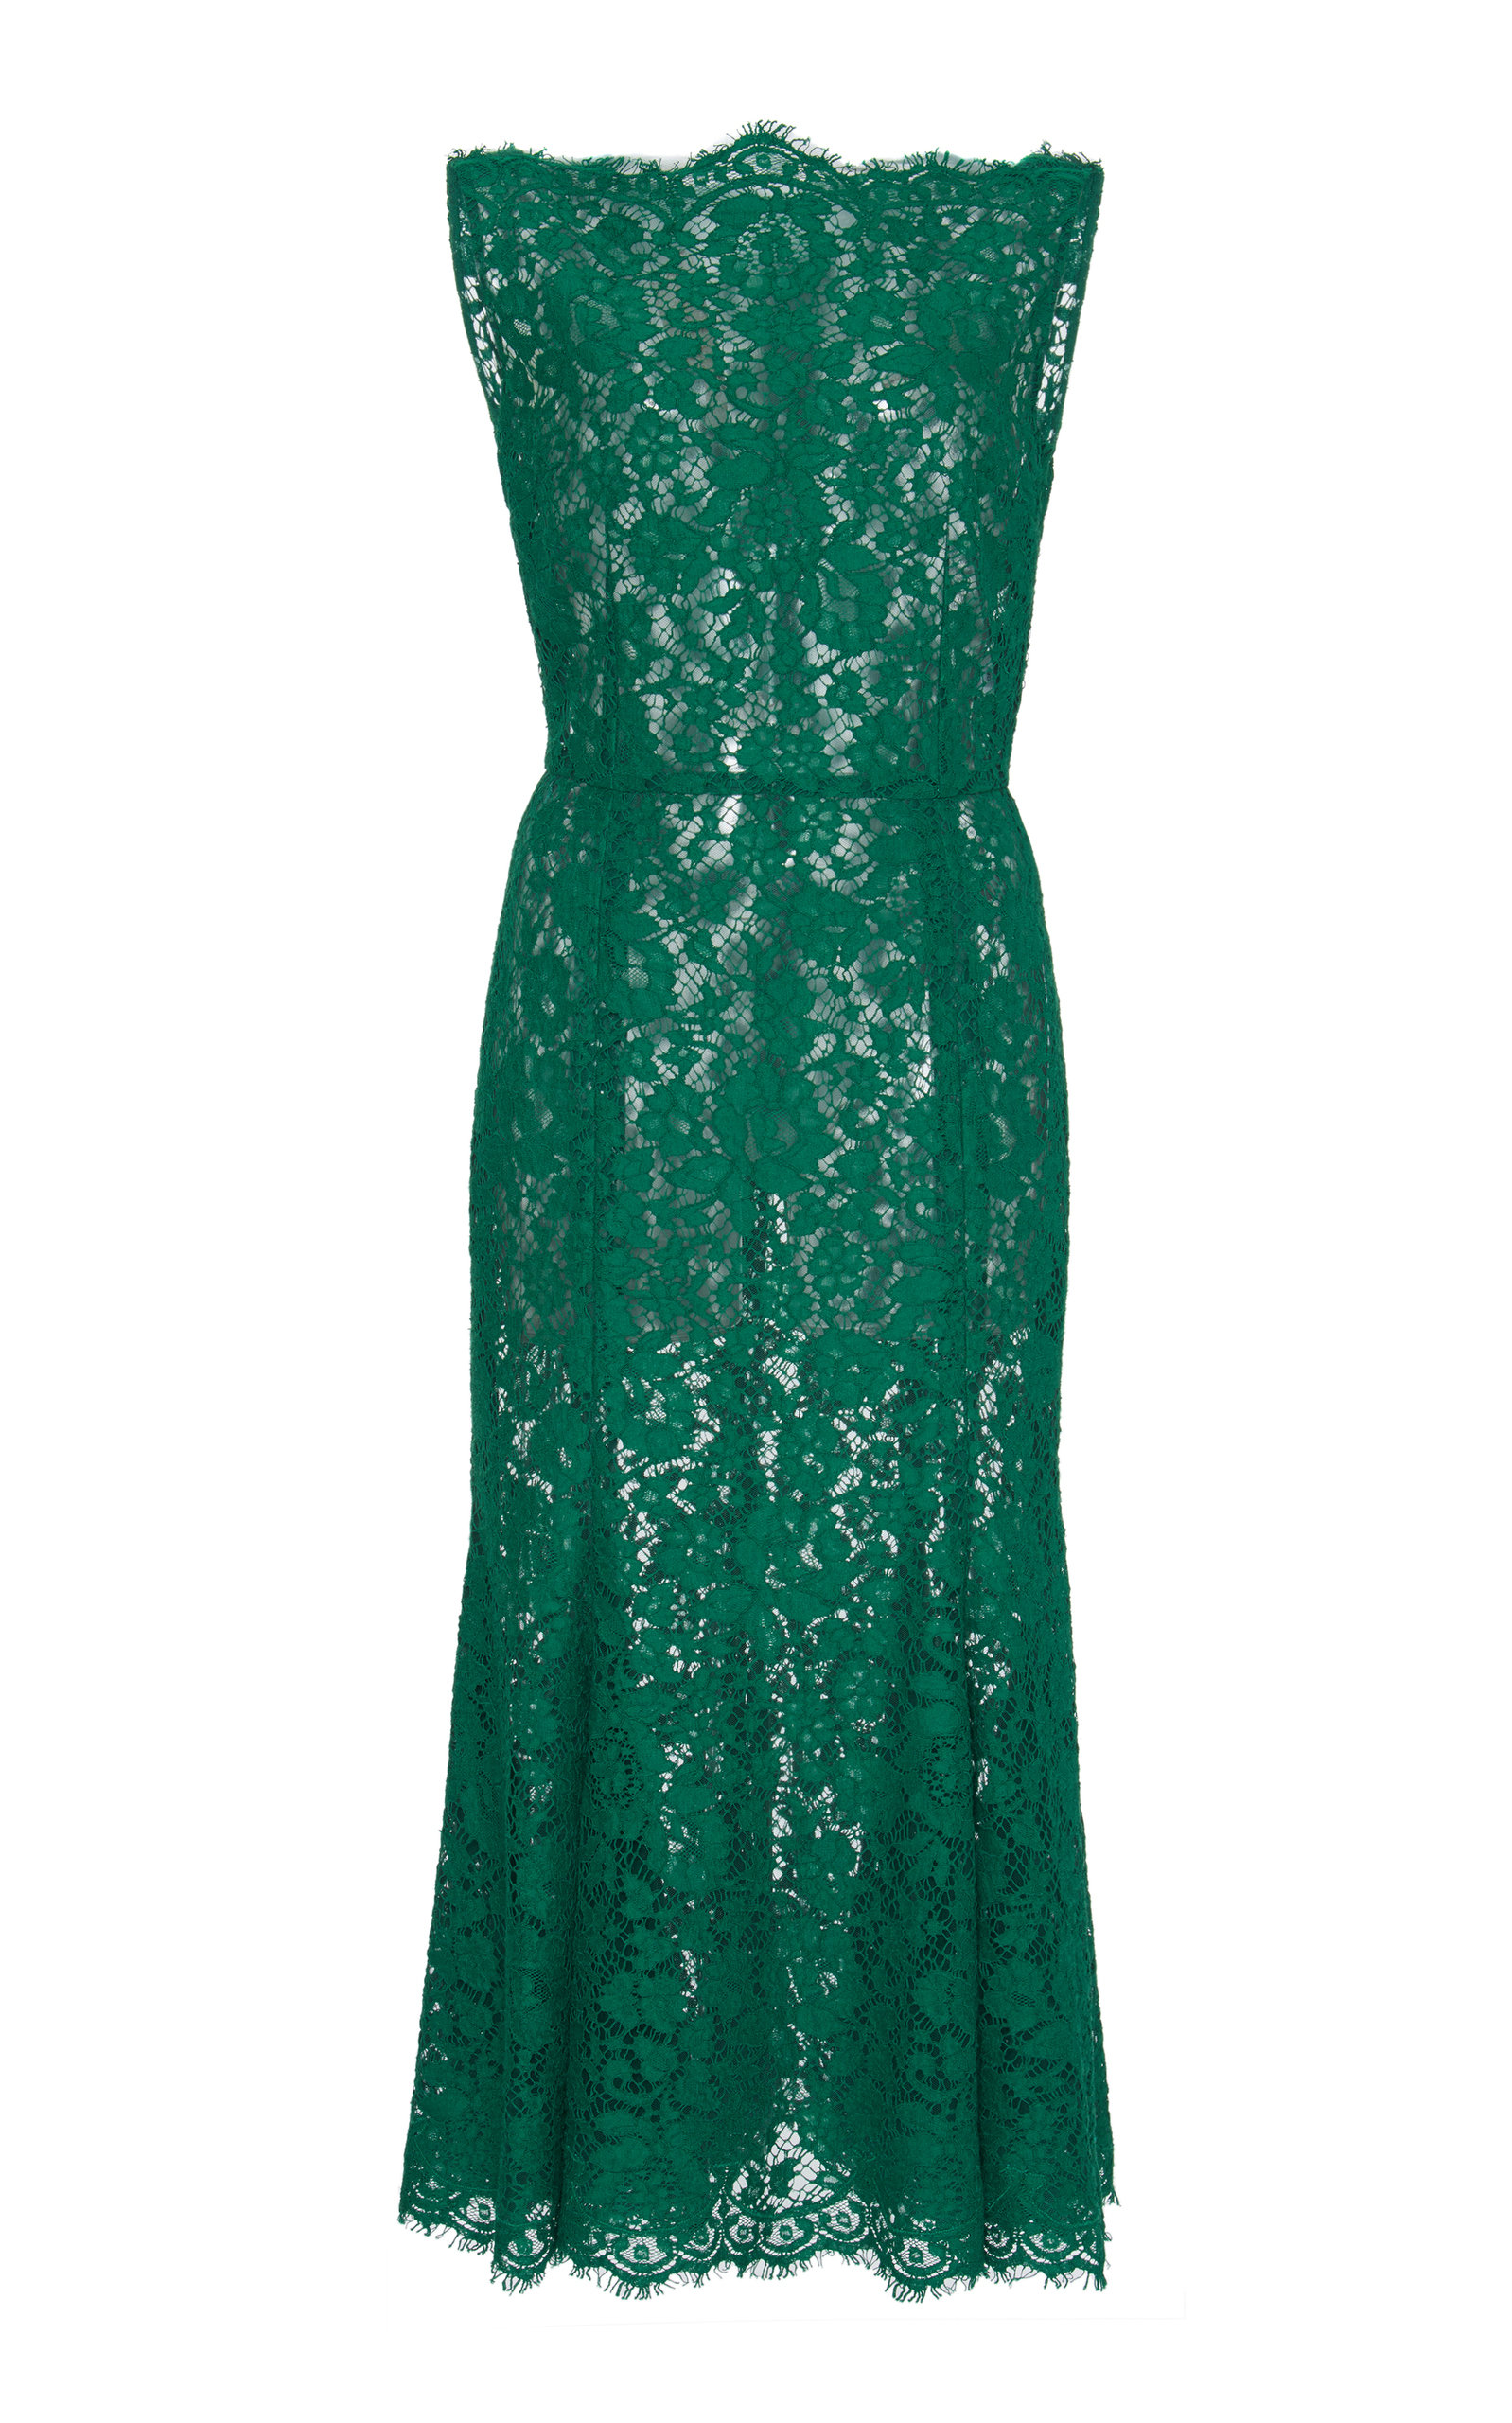 Buy Dolce & Gabbana Sleeveless Lace Midi Dress online, shop Dolce & Gabbana at the best price